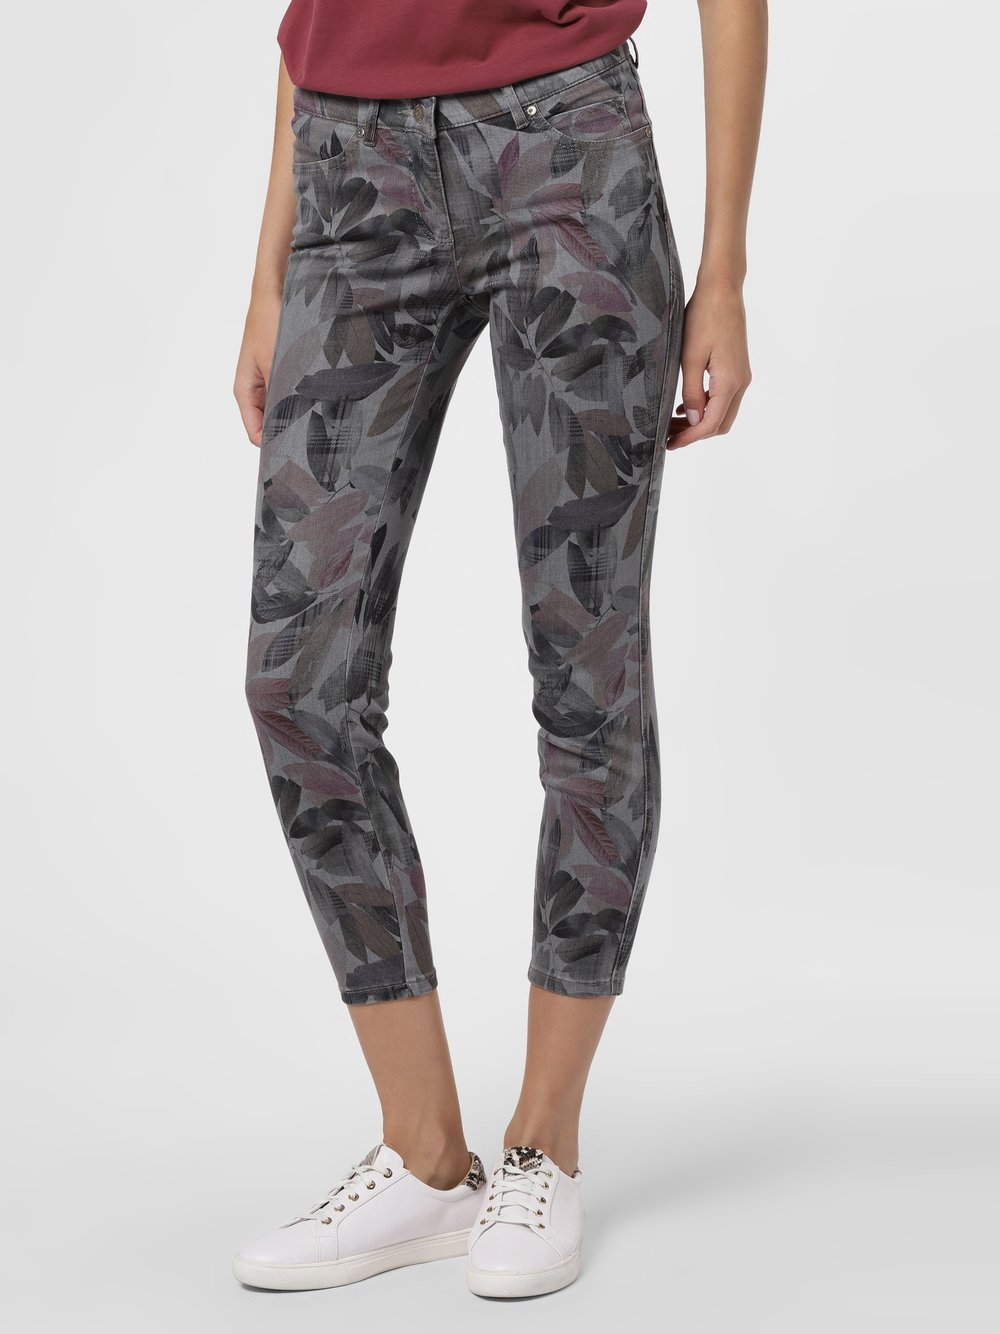 TONI – Spodnie damskie – Perfect Shape Skinny, szary Van Graaf 483469-0001-00200